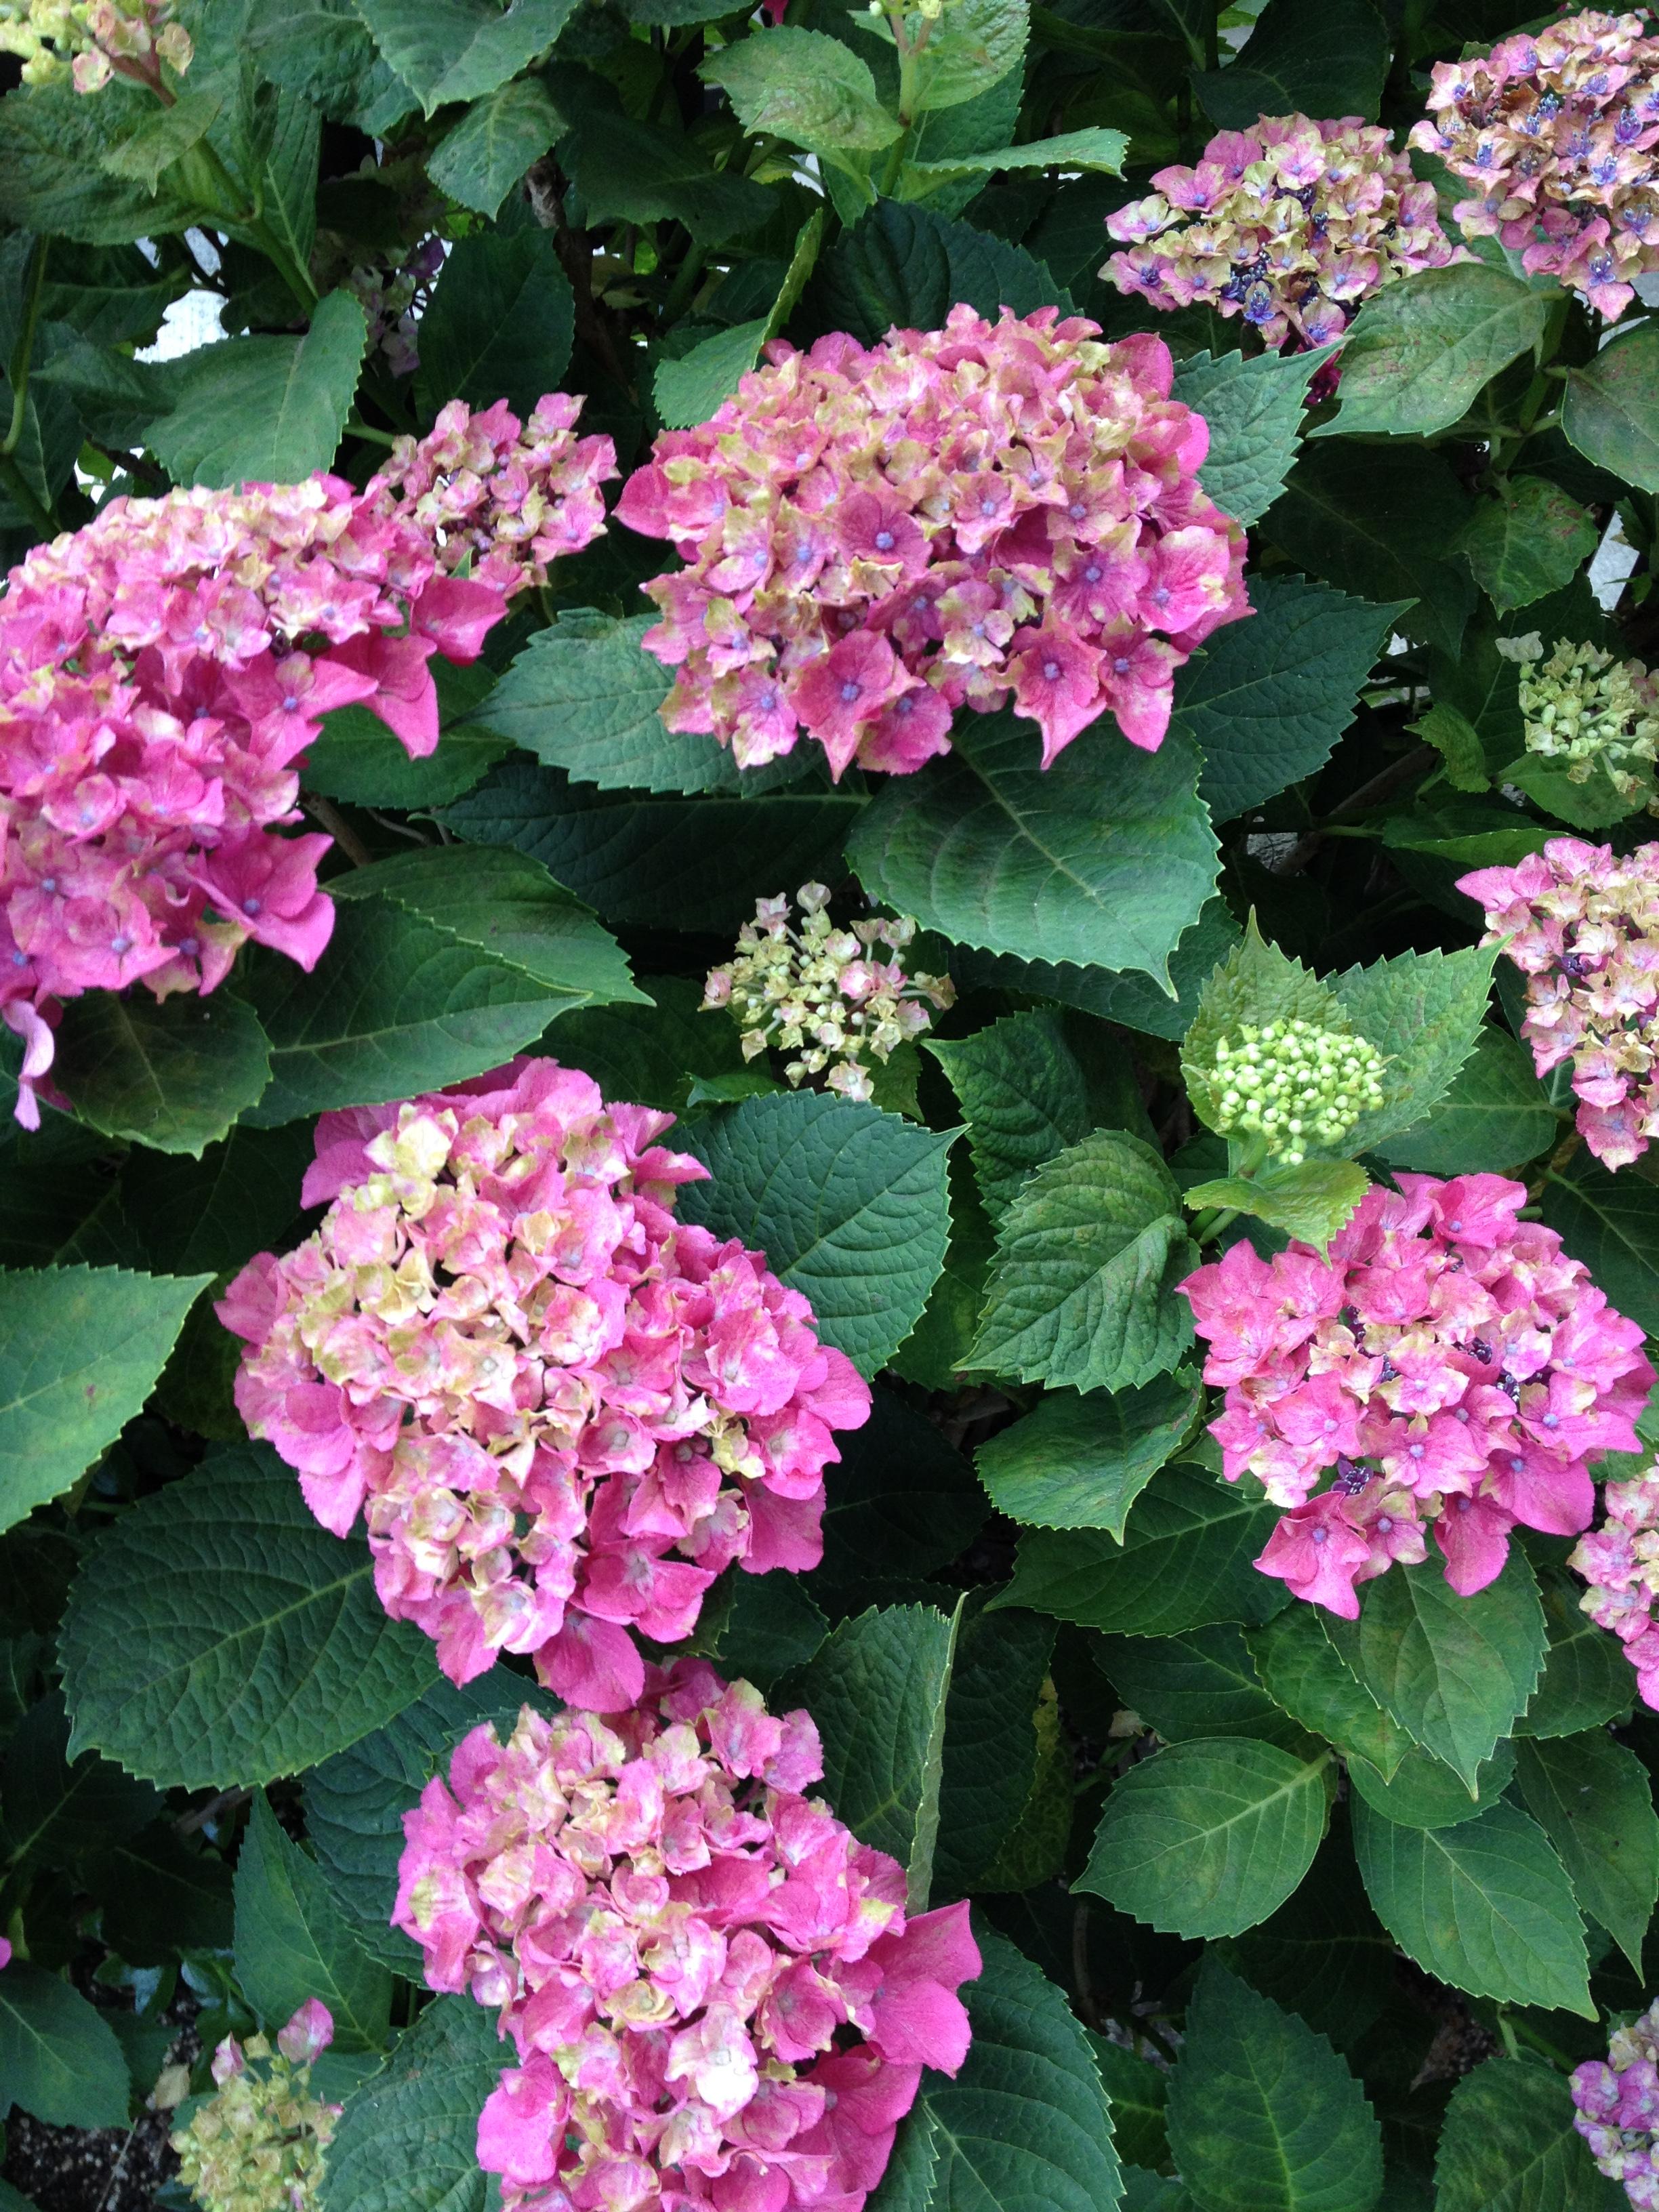 紫陽花 の 剪定